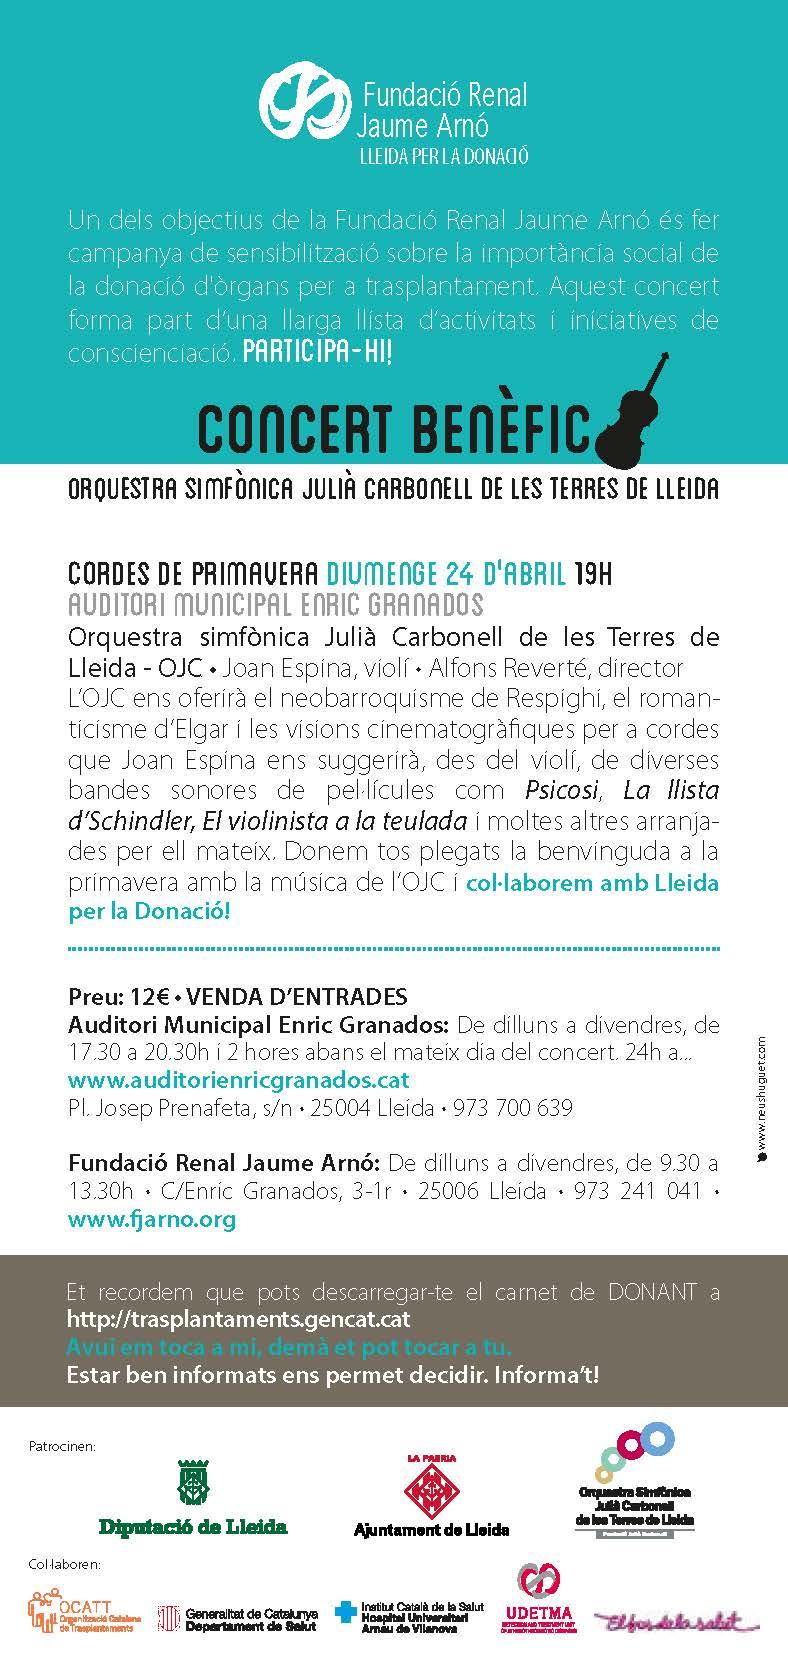 FRJA-flyer-concert10x21-bo_Página_2